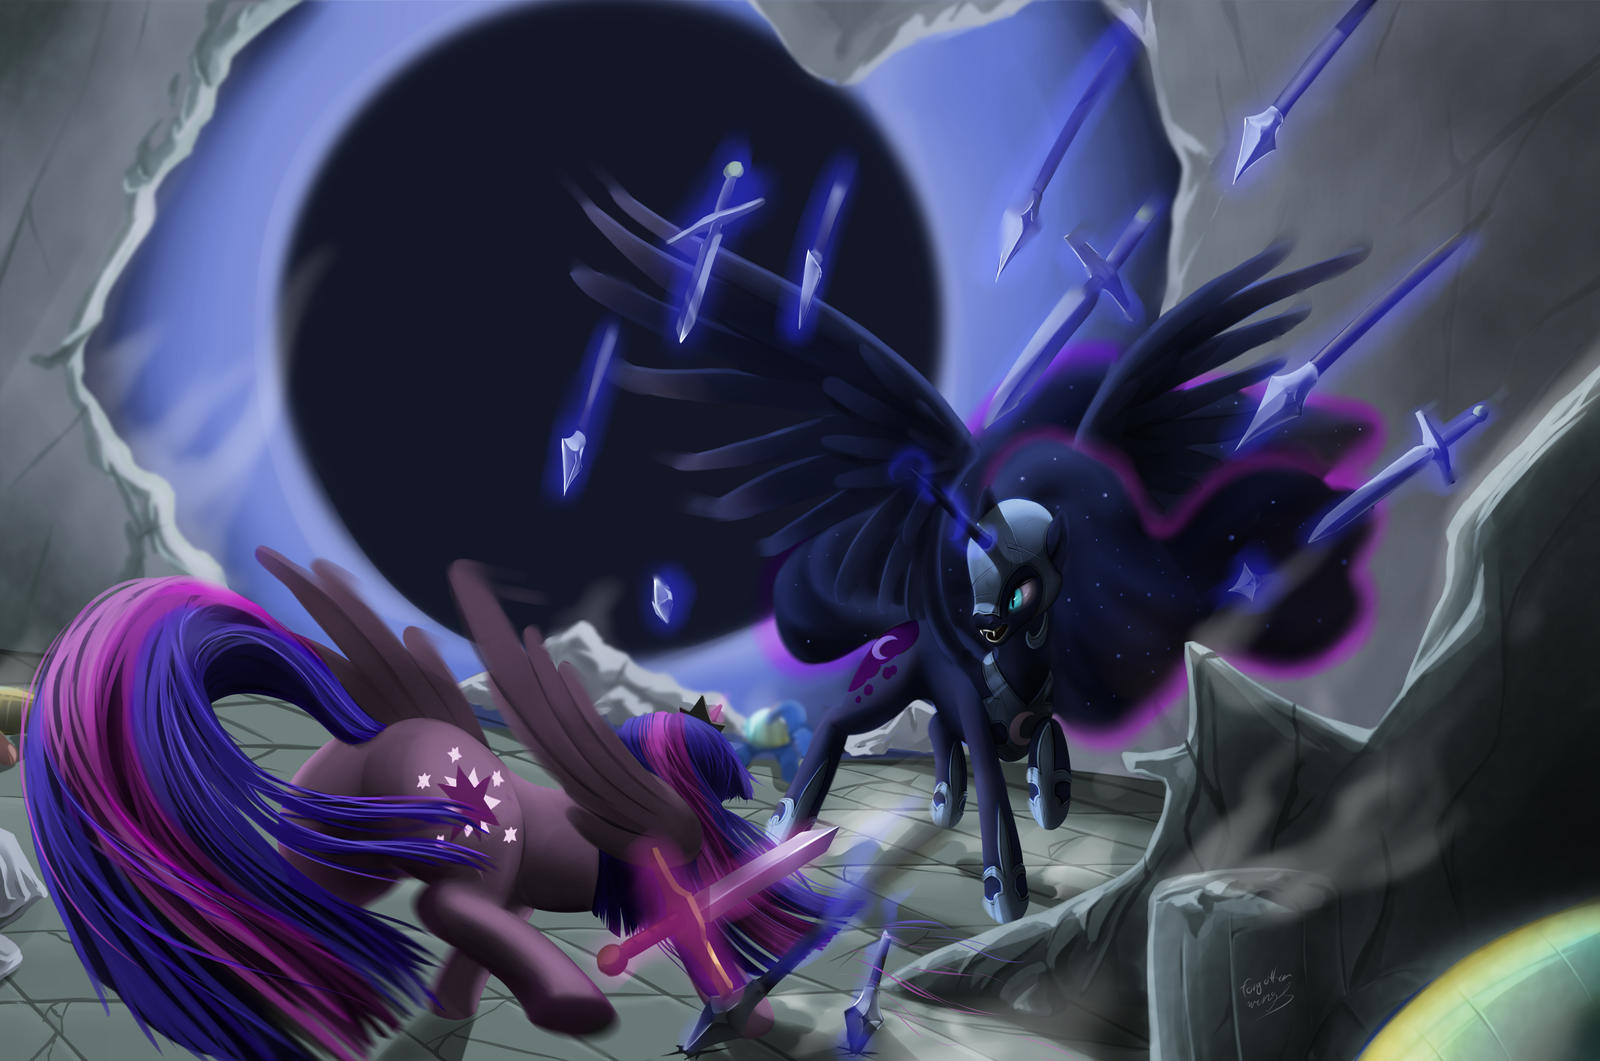 twilight sparkle versus nightmare moon by forgotten-wings